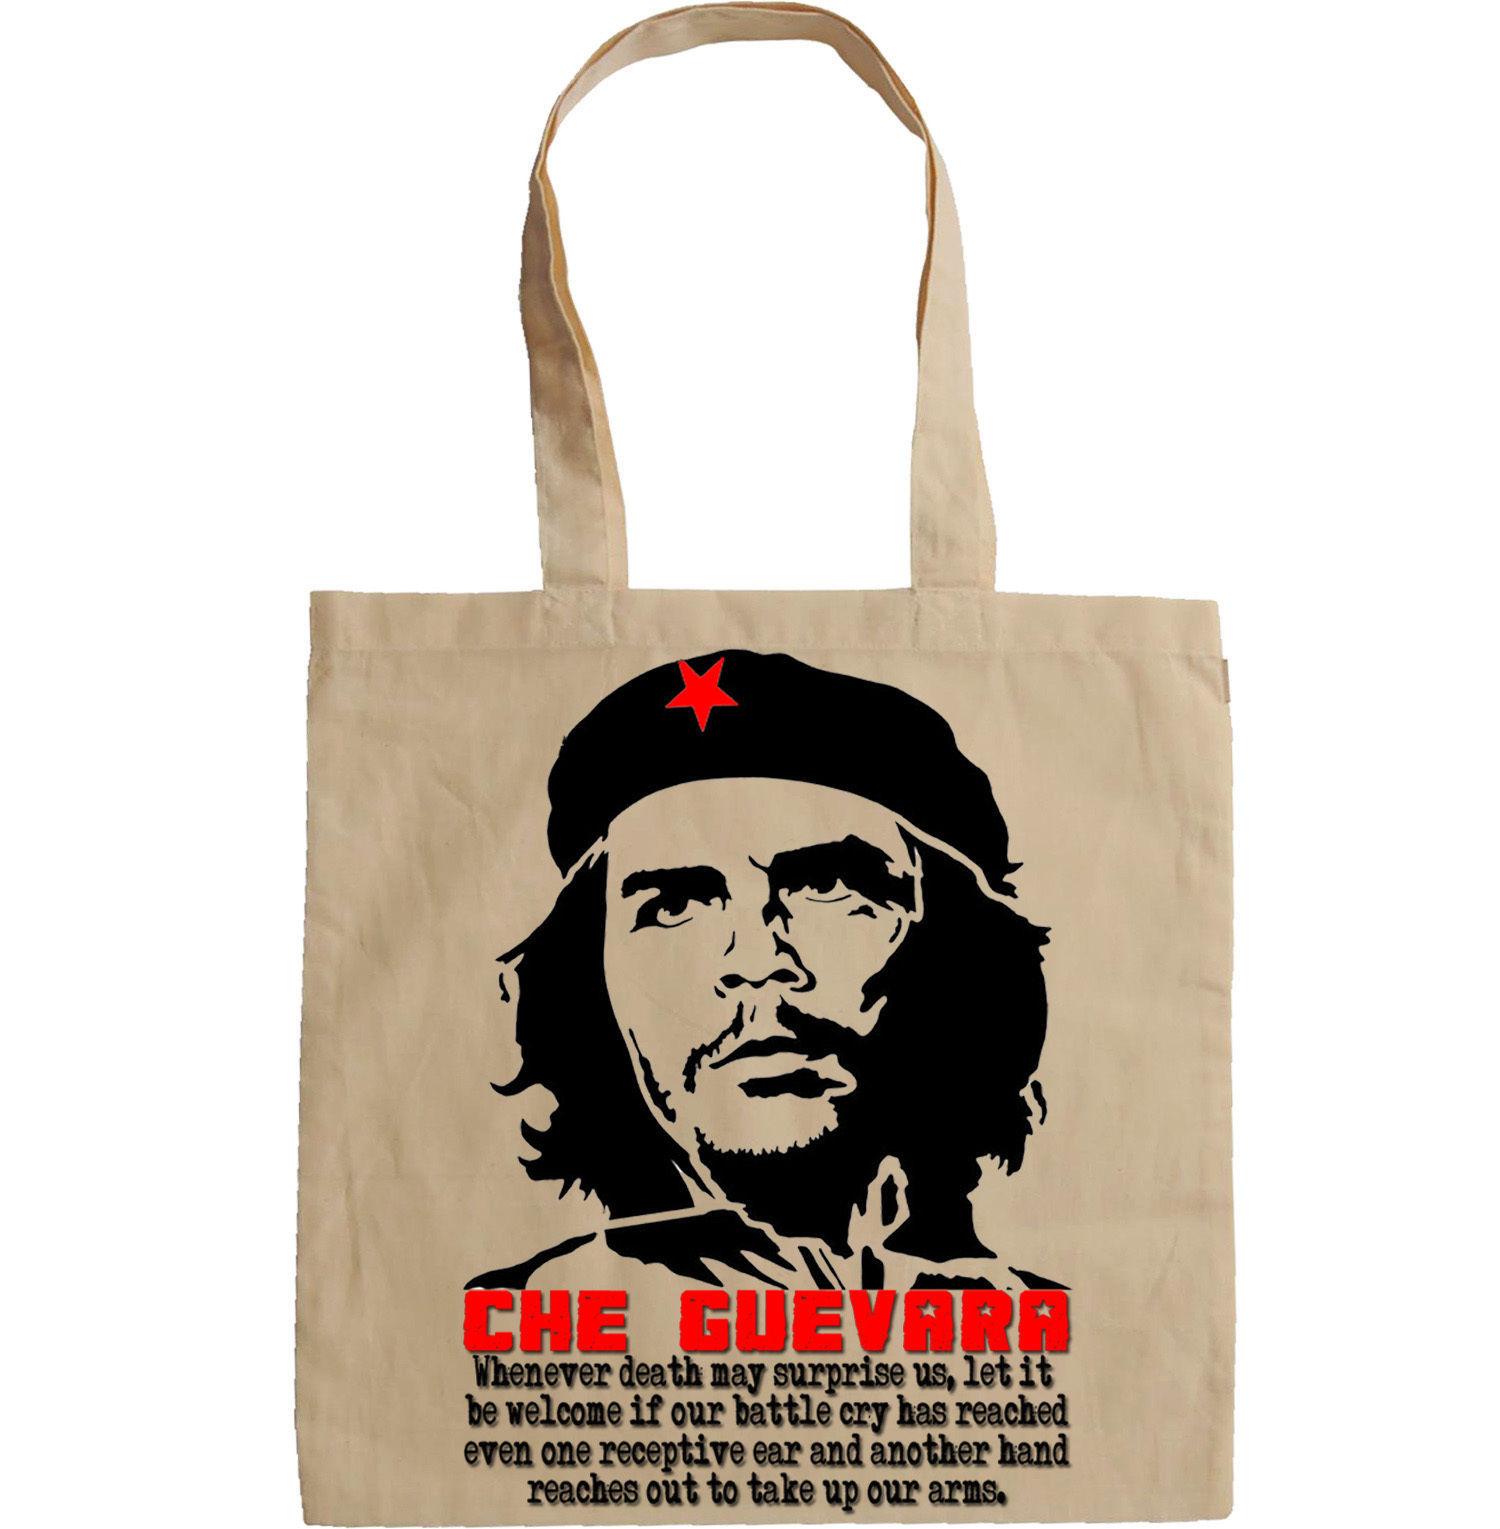 CHE GUEVARA CUBA REVOLUTION QUOTE - NEW AMAZING GRAPHIC HAND BAG/TOTE BAG